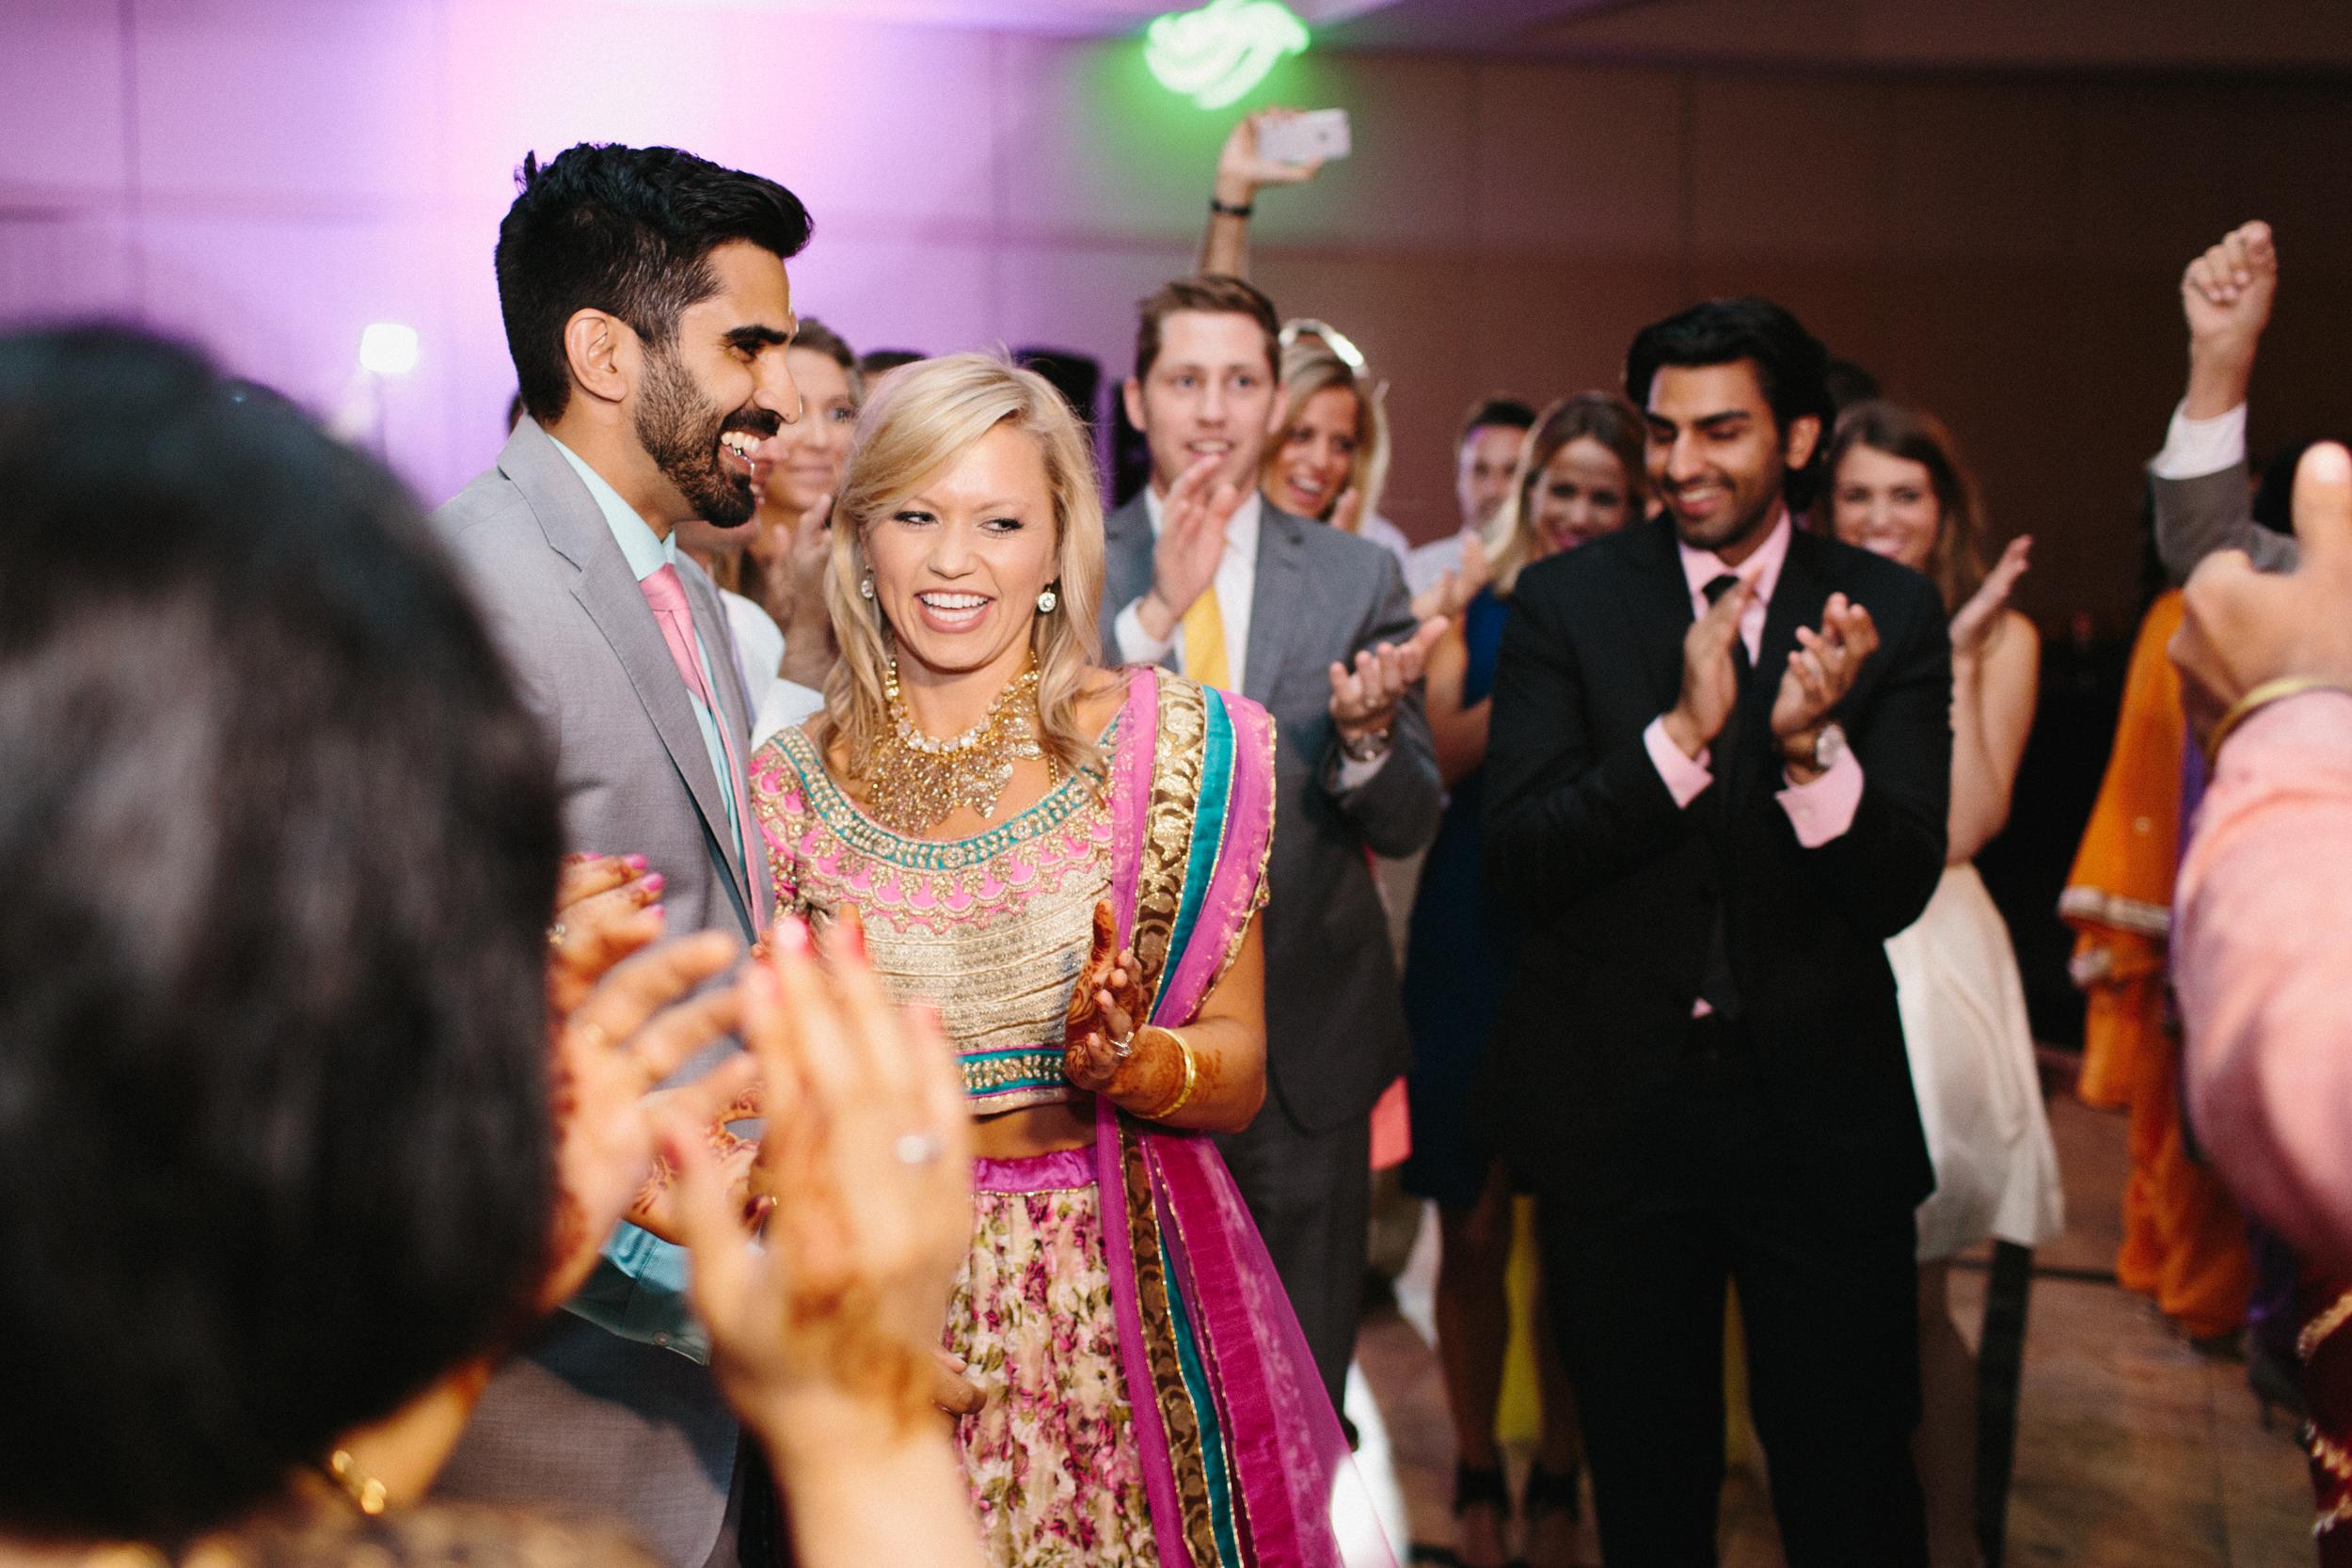 Detroit Michigan Sikh Wedding Photographer Mae Stier-060.jpg